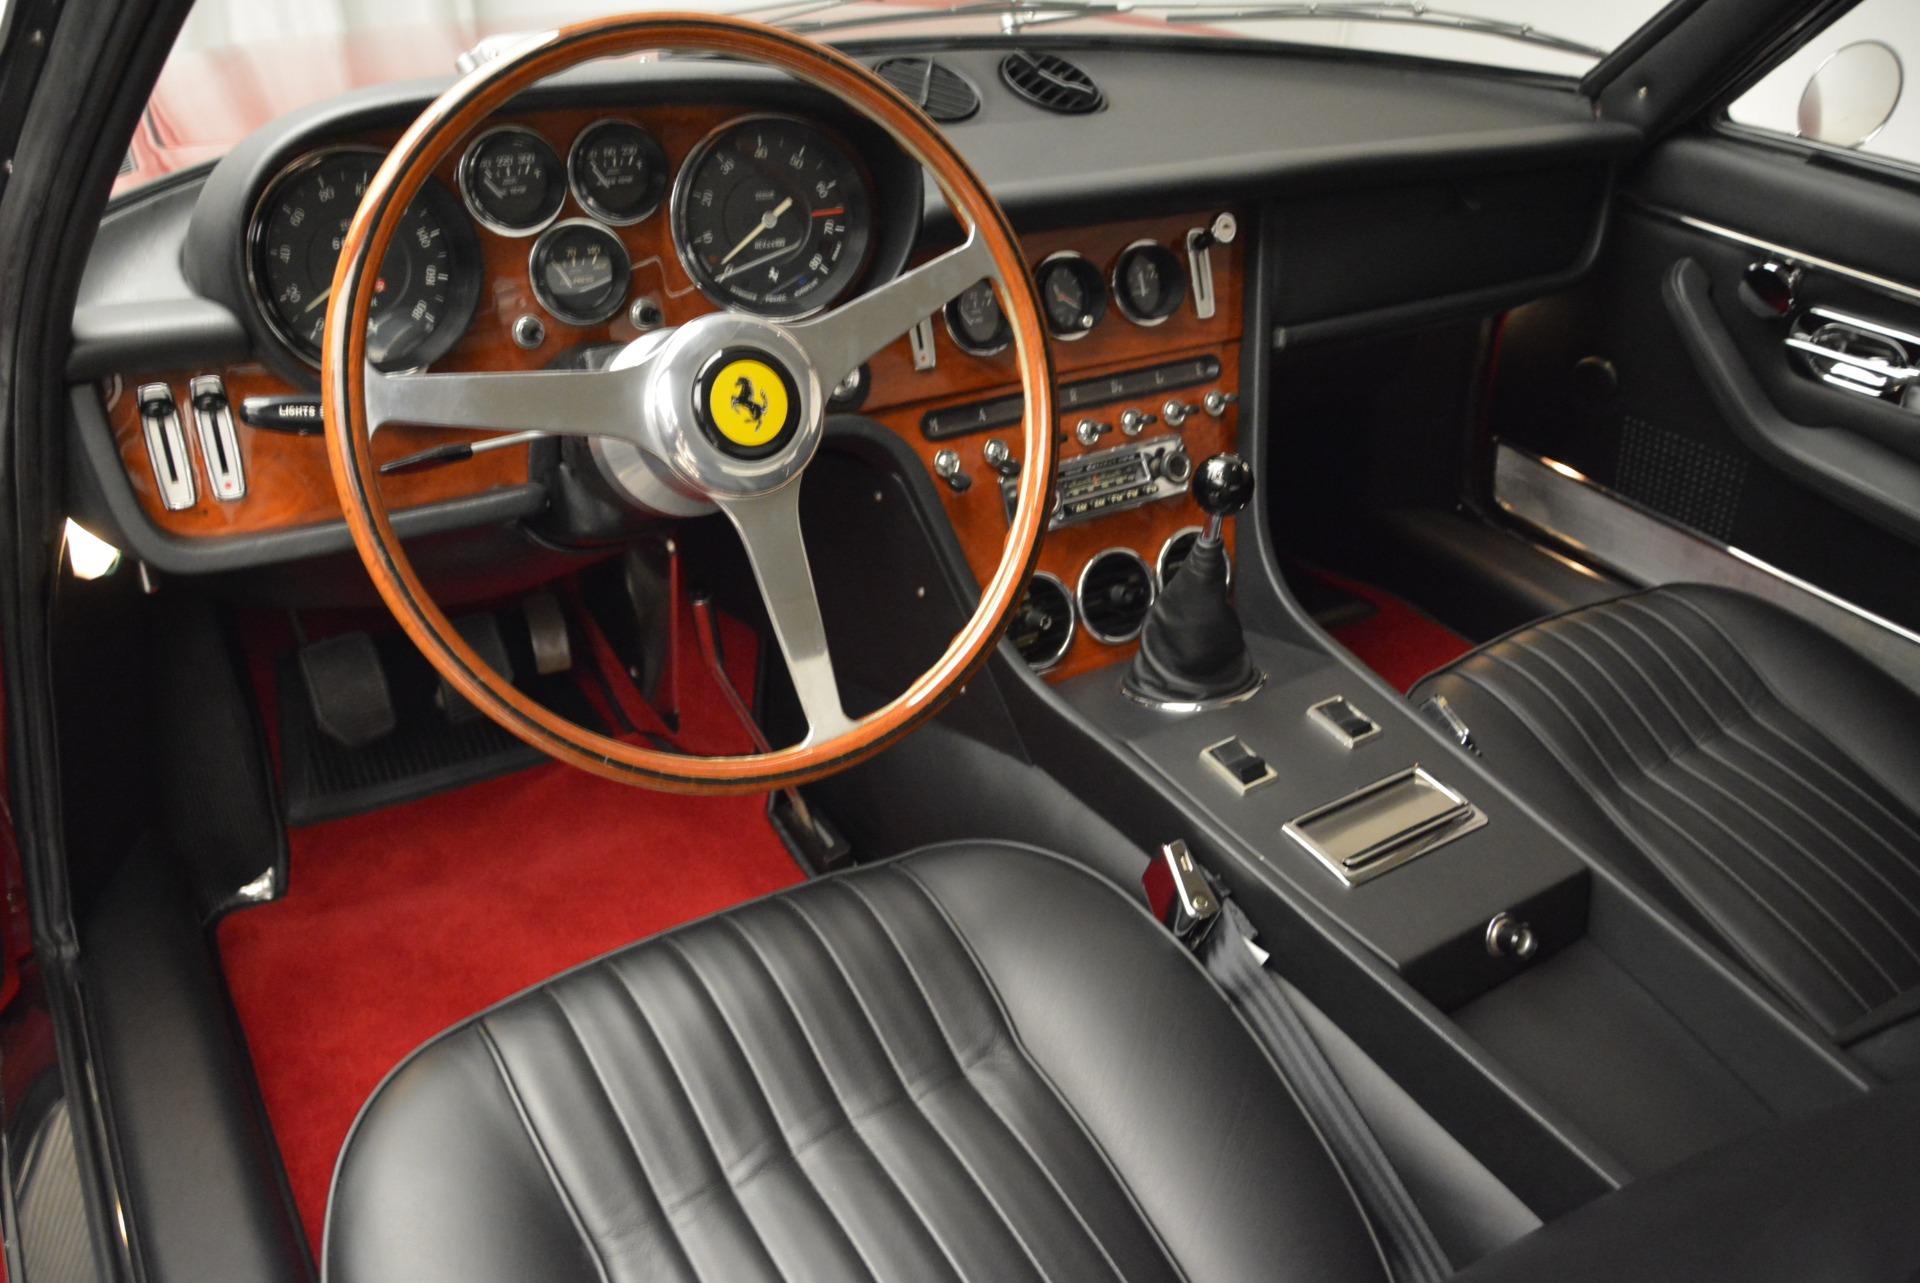 Used 1969 Ferrari 365 GT 2+2  For Sale In Greenwich, CT 1995_p13